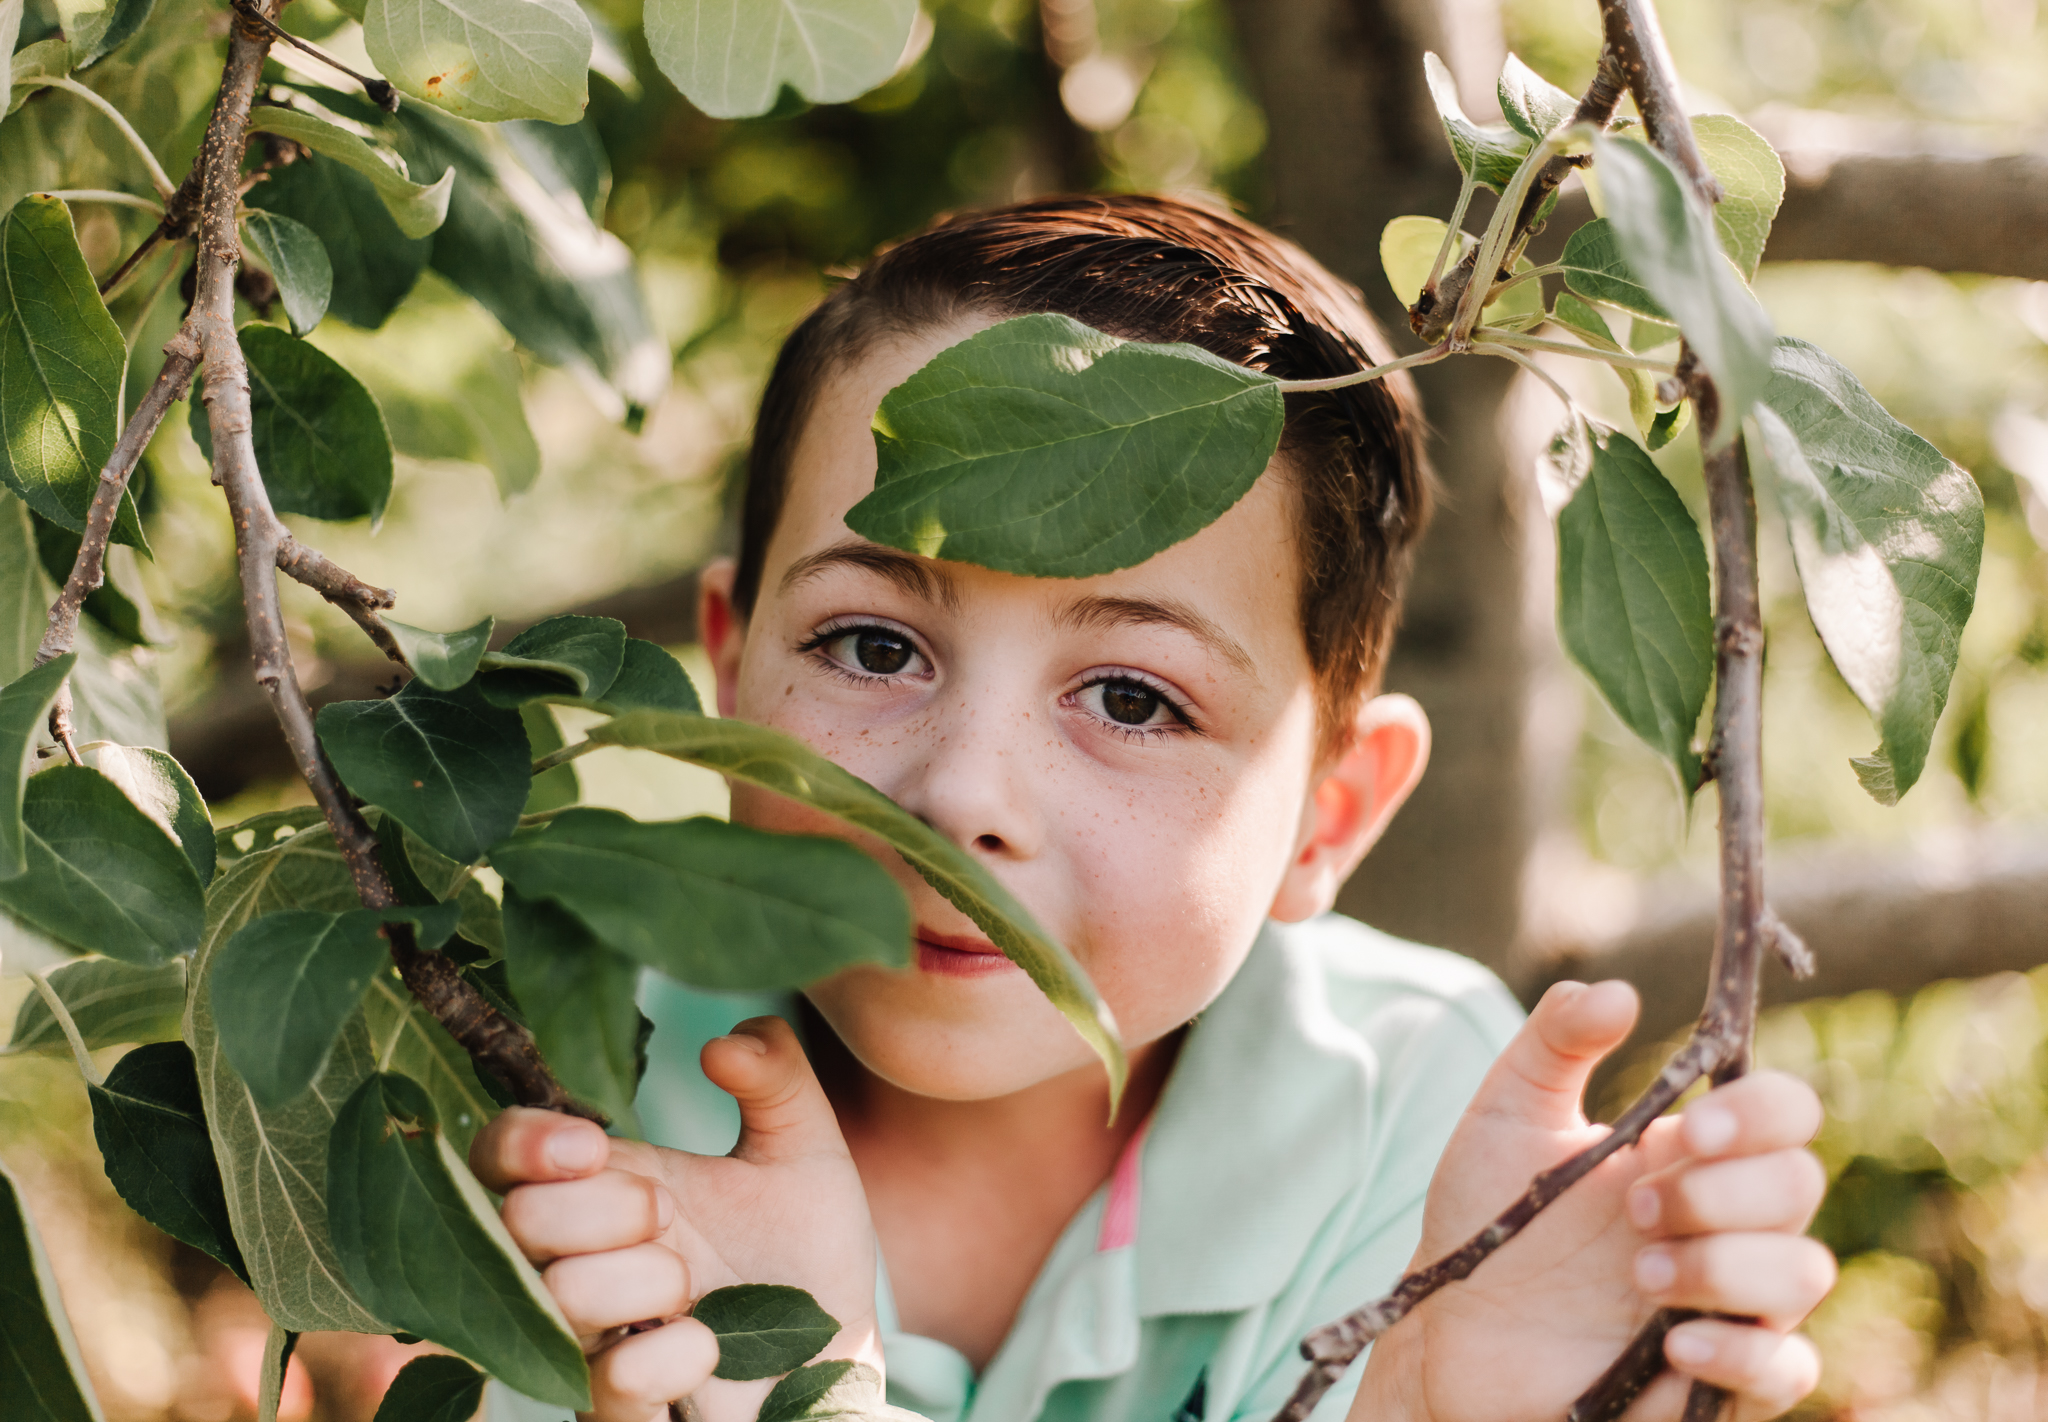 maine-lifestyle-portrait-photographer-mini-session-son-freckles-apple-orchard-fall-mini-session-2018.jpg